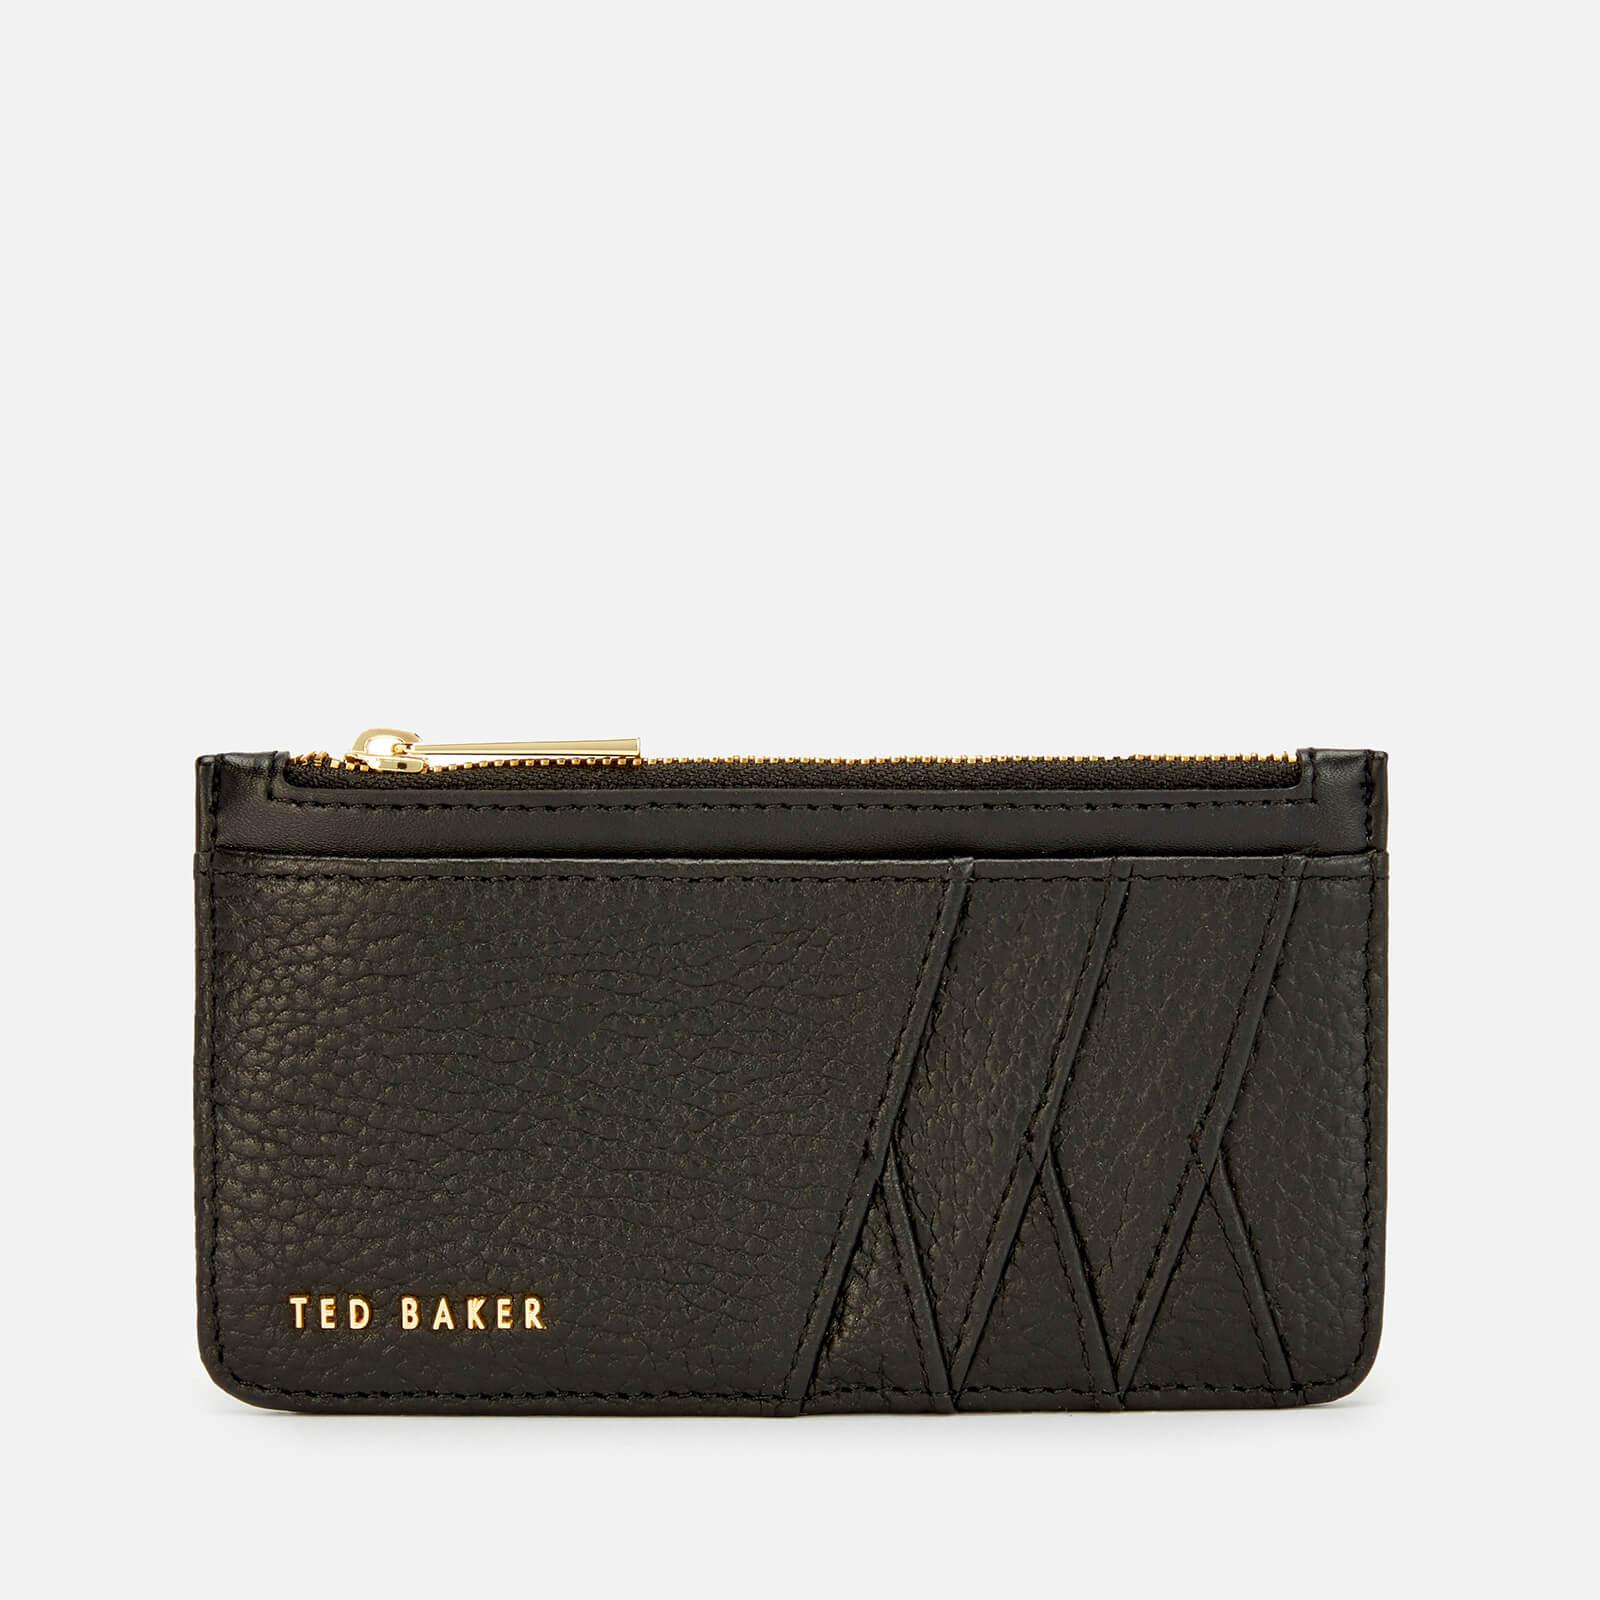 Ted Baker Women's Gerii Diagonal Zipped Credit Card Holder - Black